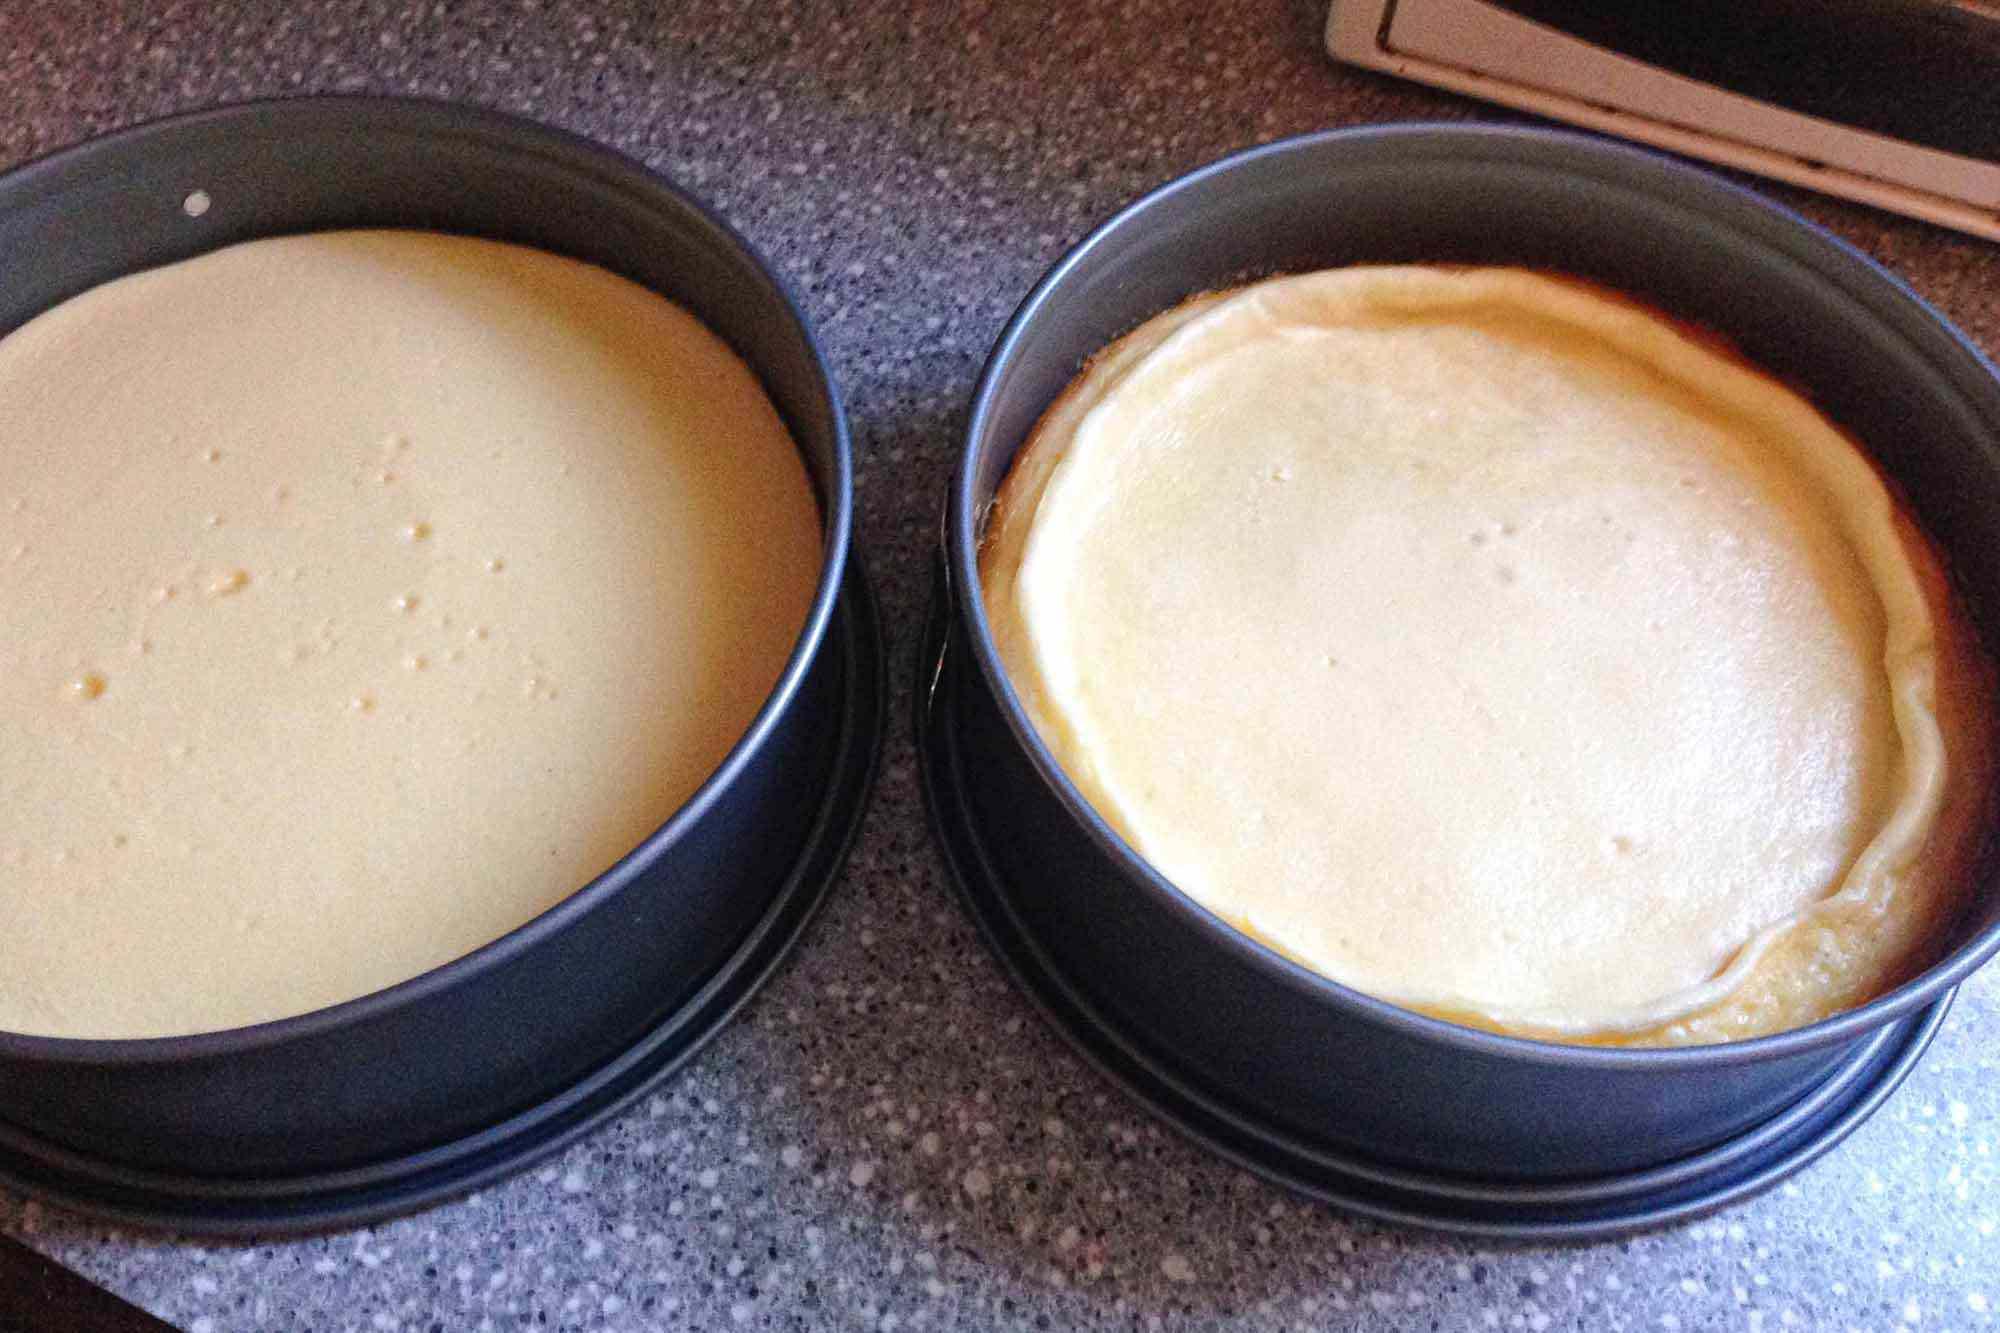 How to bake creamy cheesecake